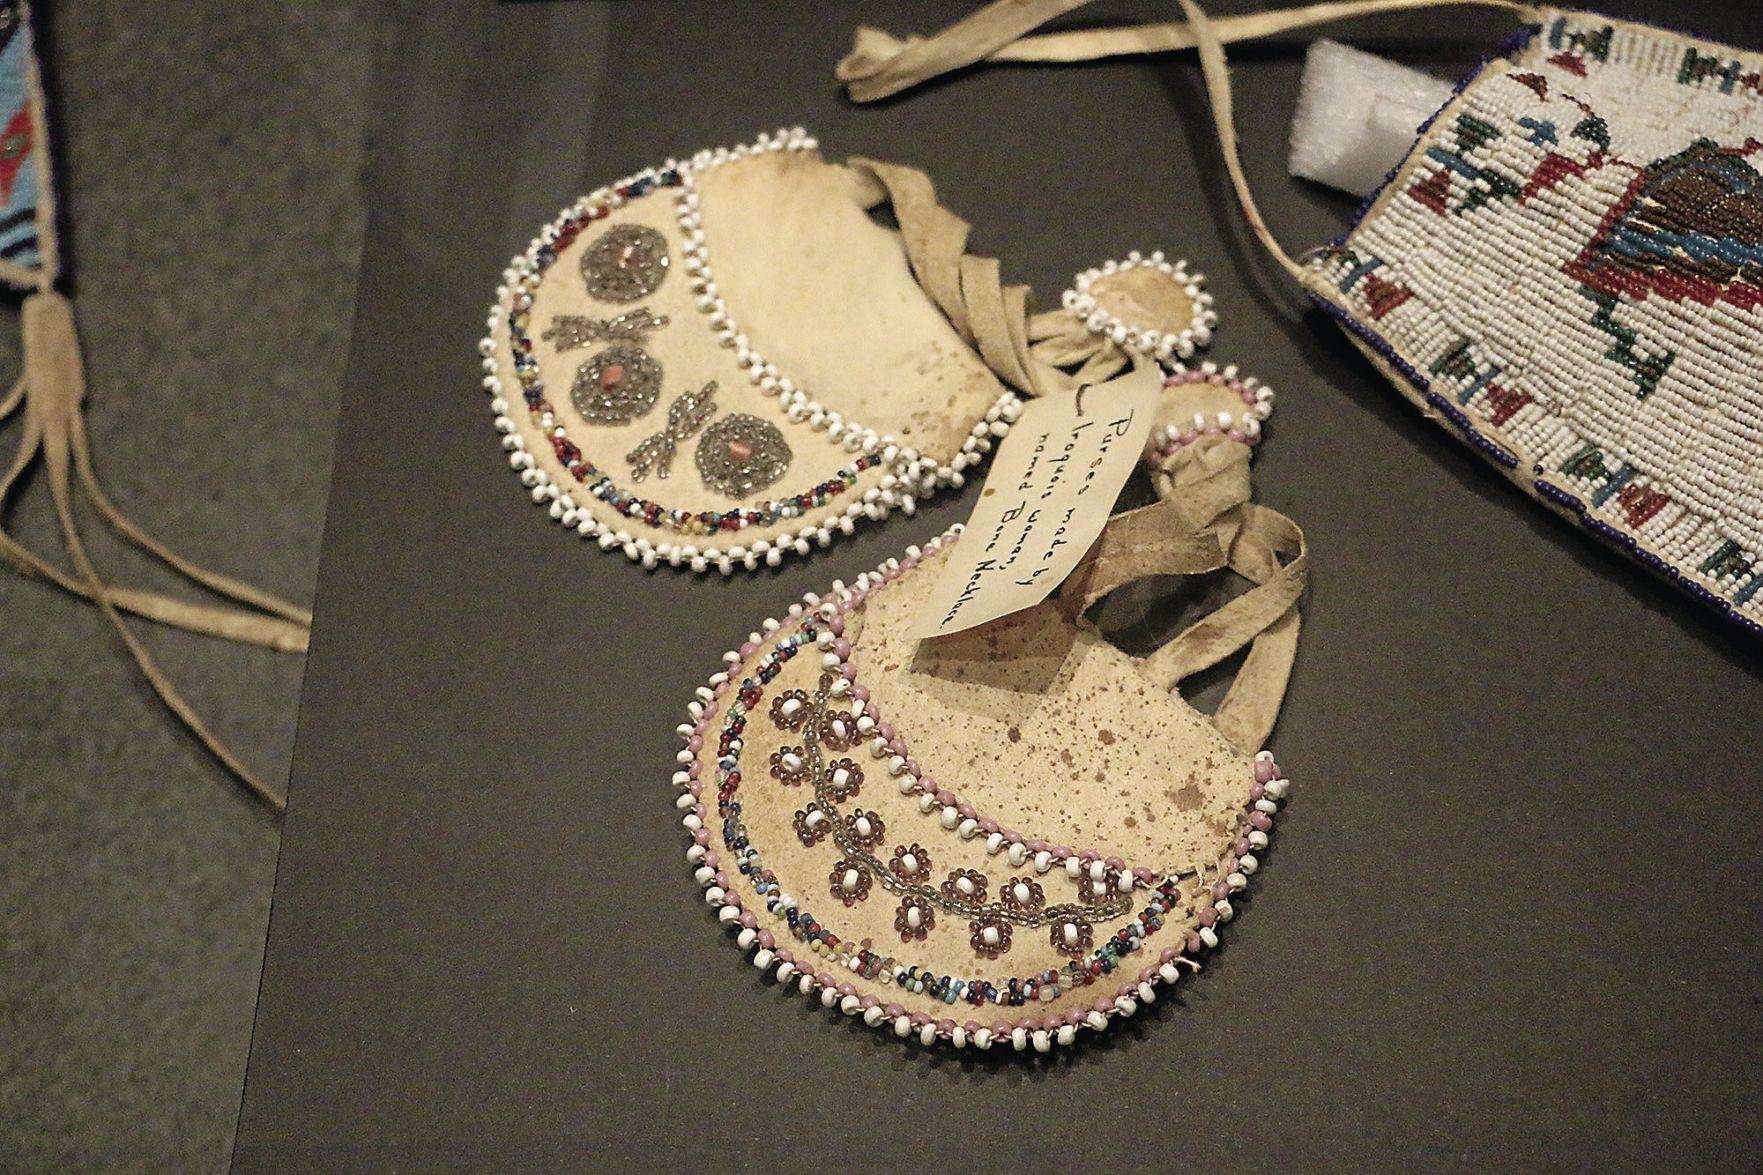 PHOTOS Agate Fossil Beds Exhibit Exhibit features